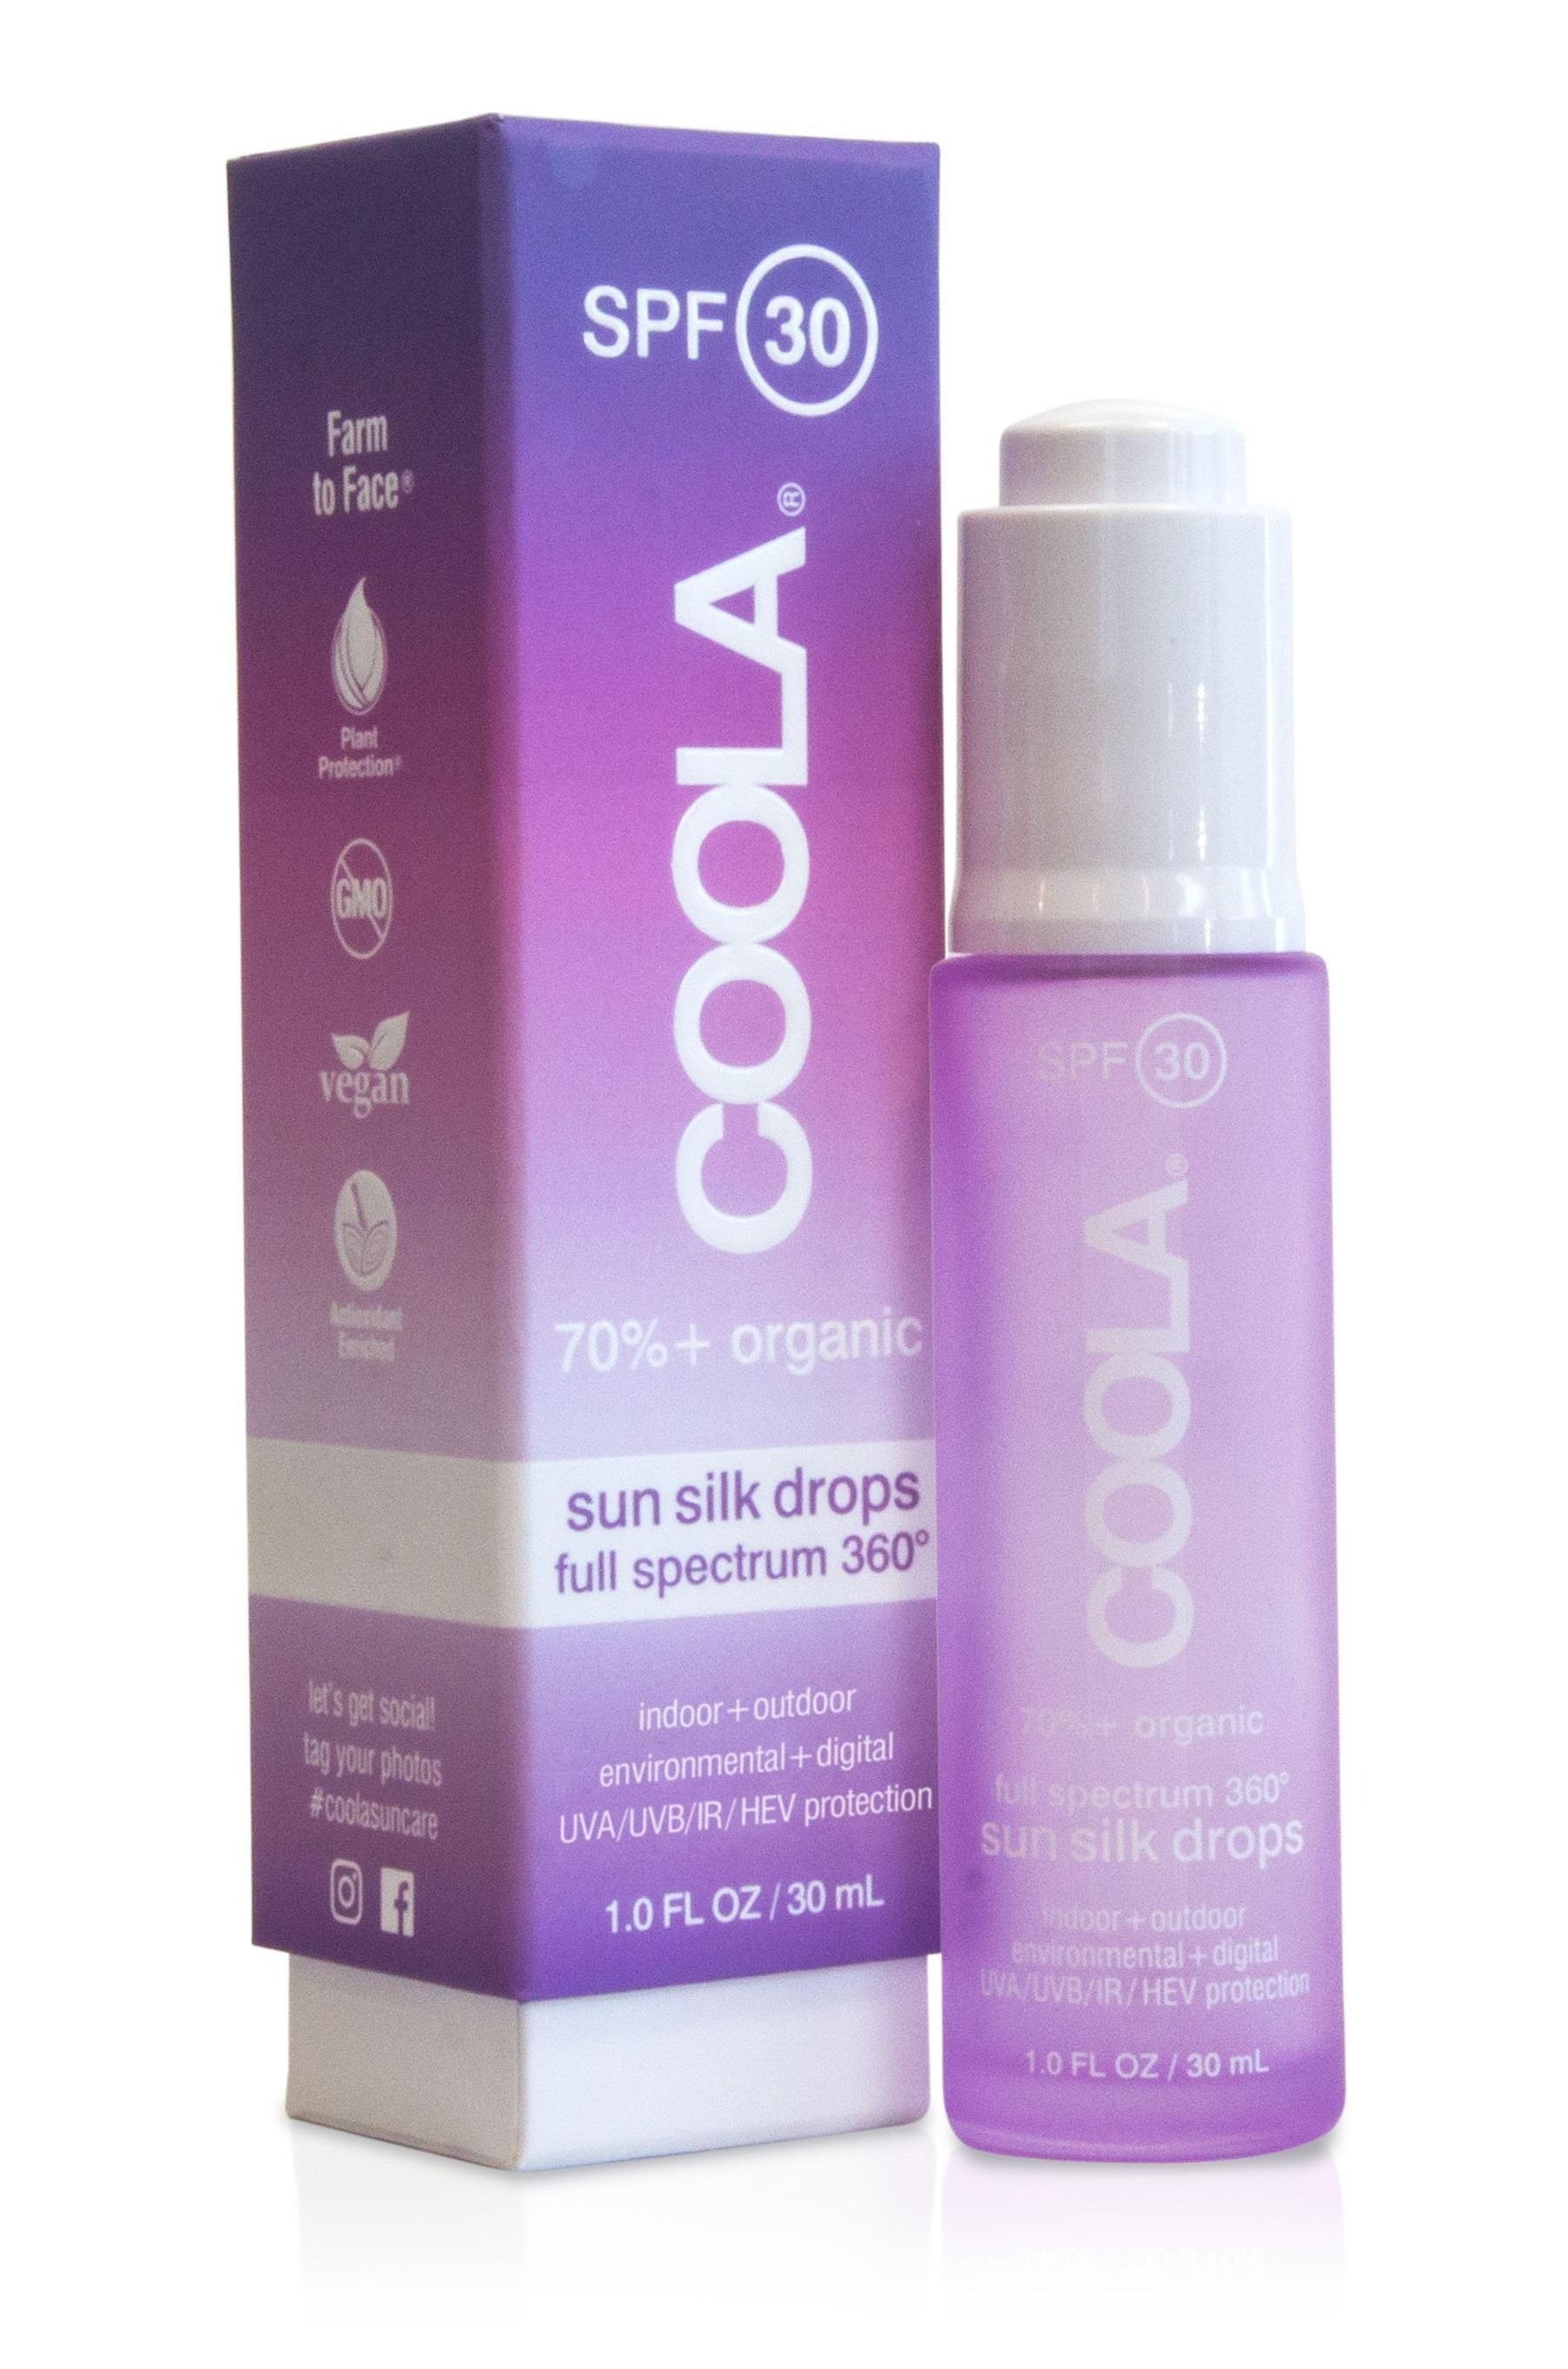 COOLA Organic SPF 30 Full Spectrum 360° Sun Silk Drops